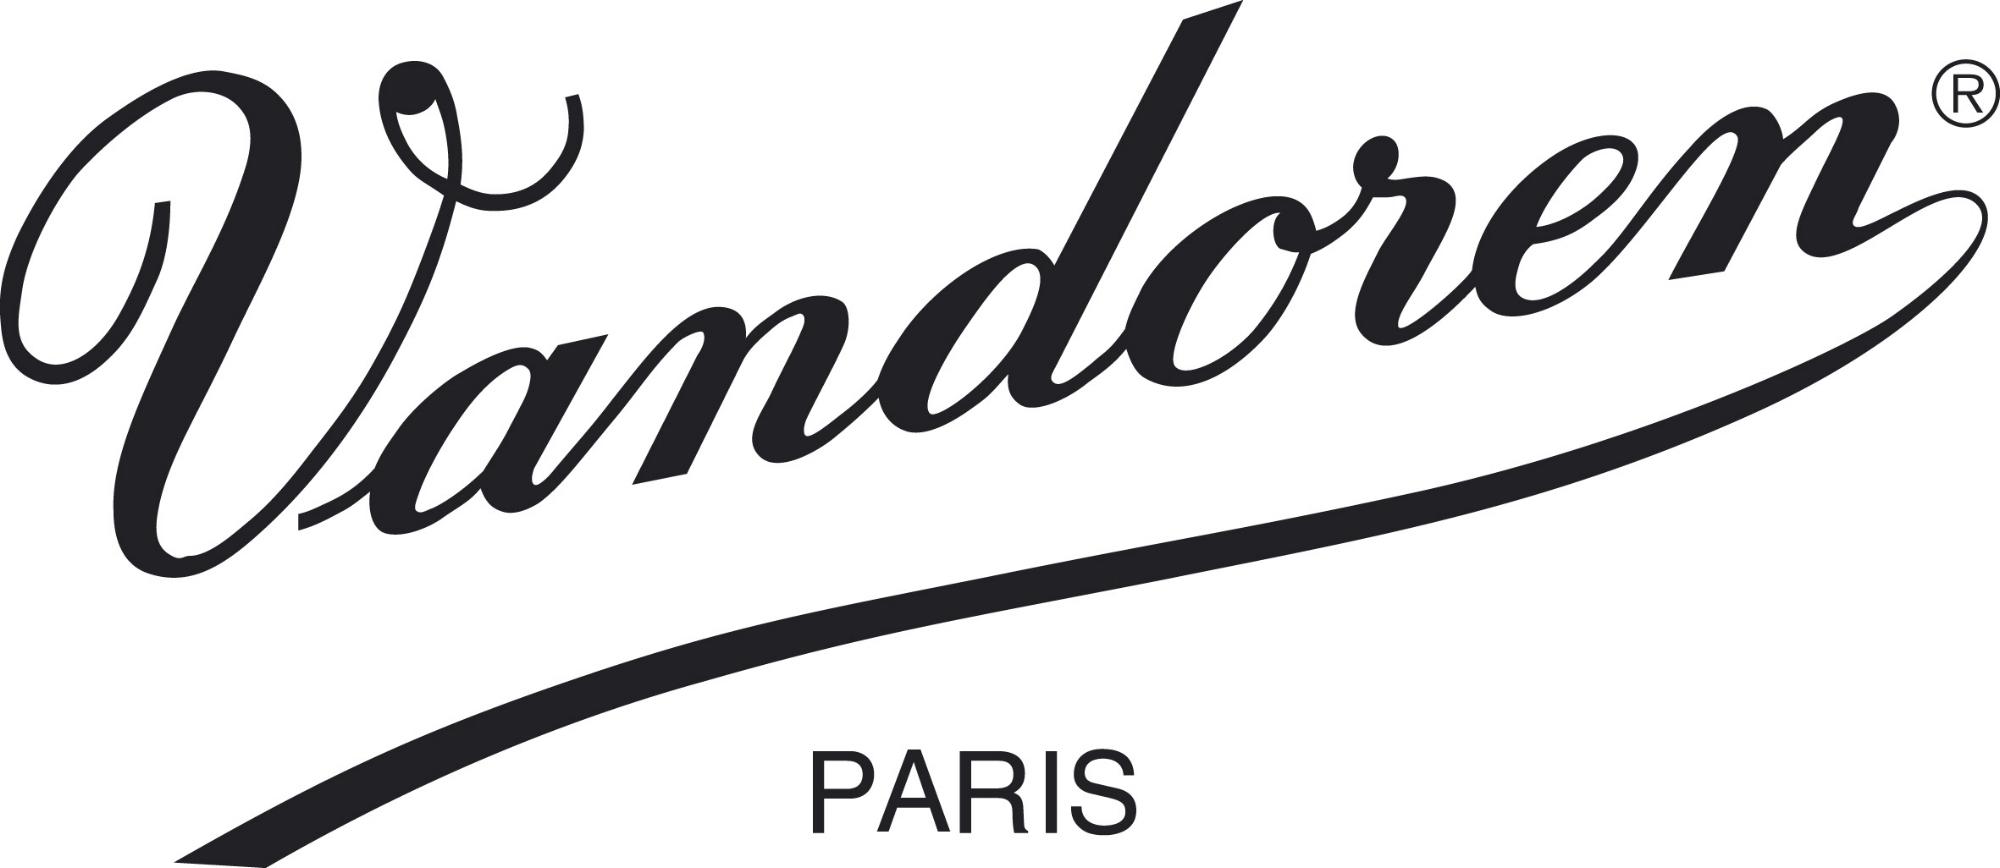 Vandoren logo.jpg